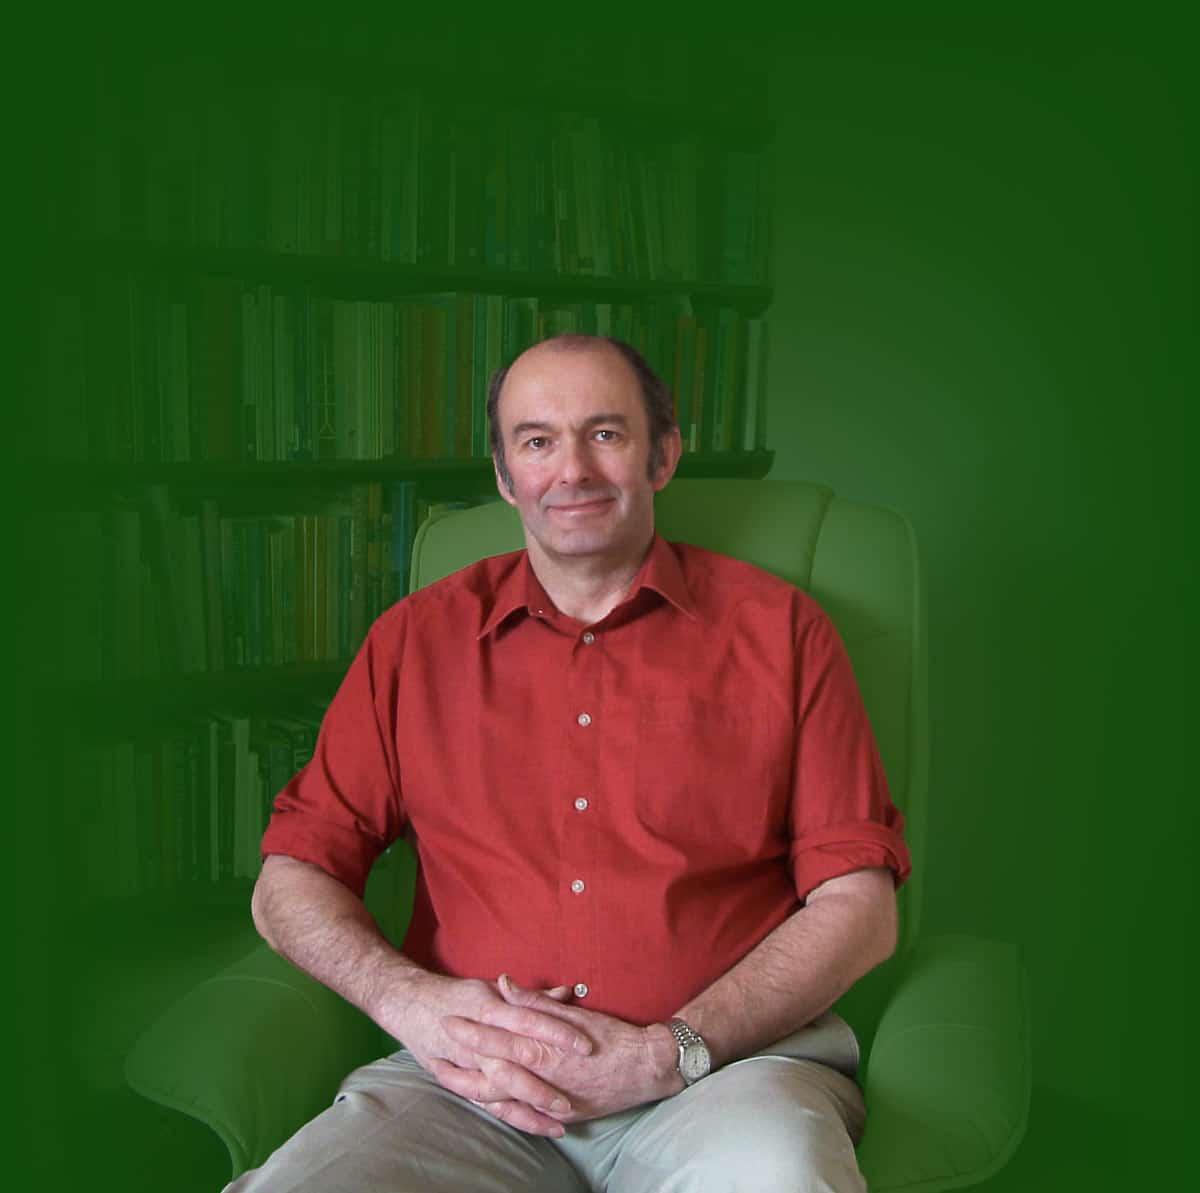 Dr. Carl Stonier